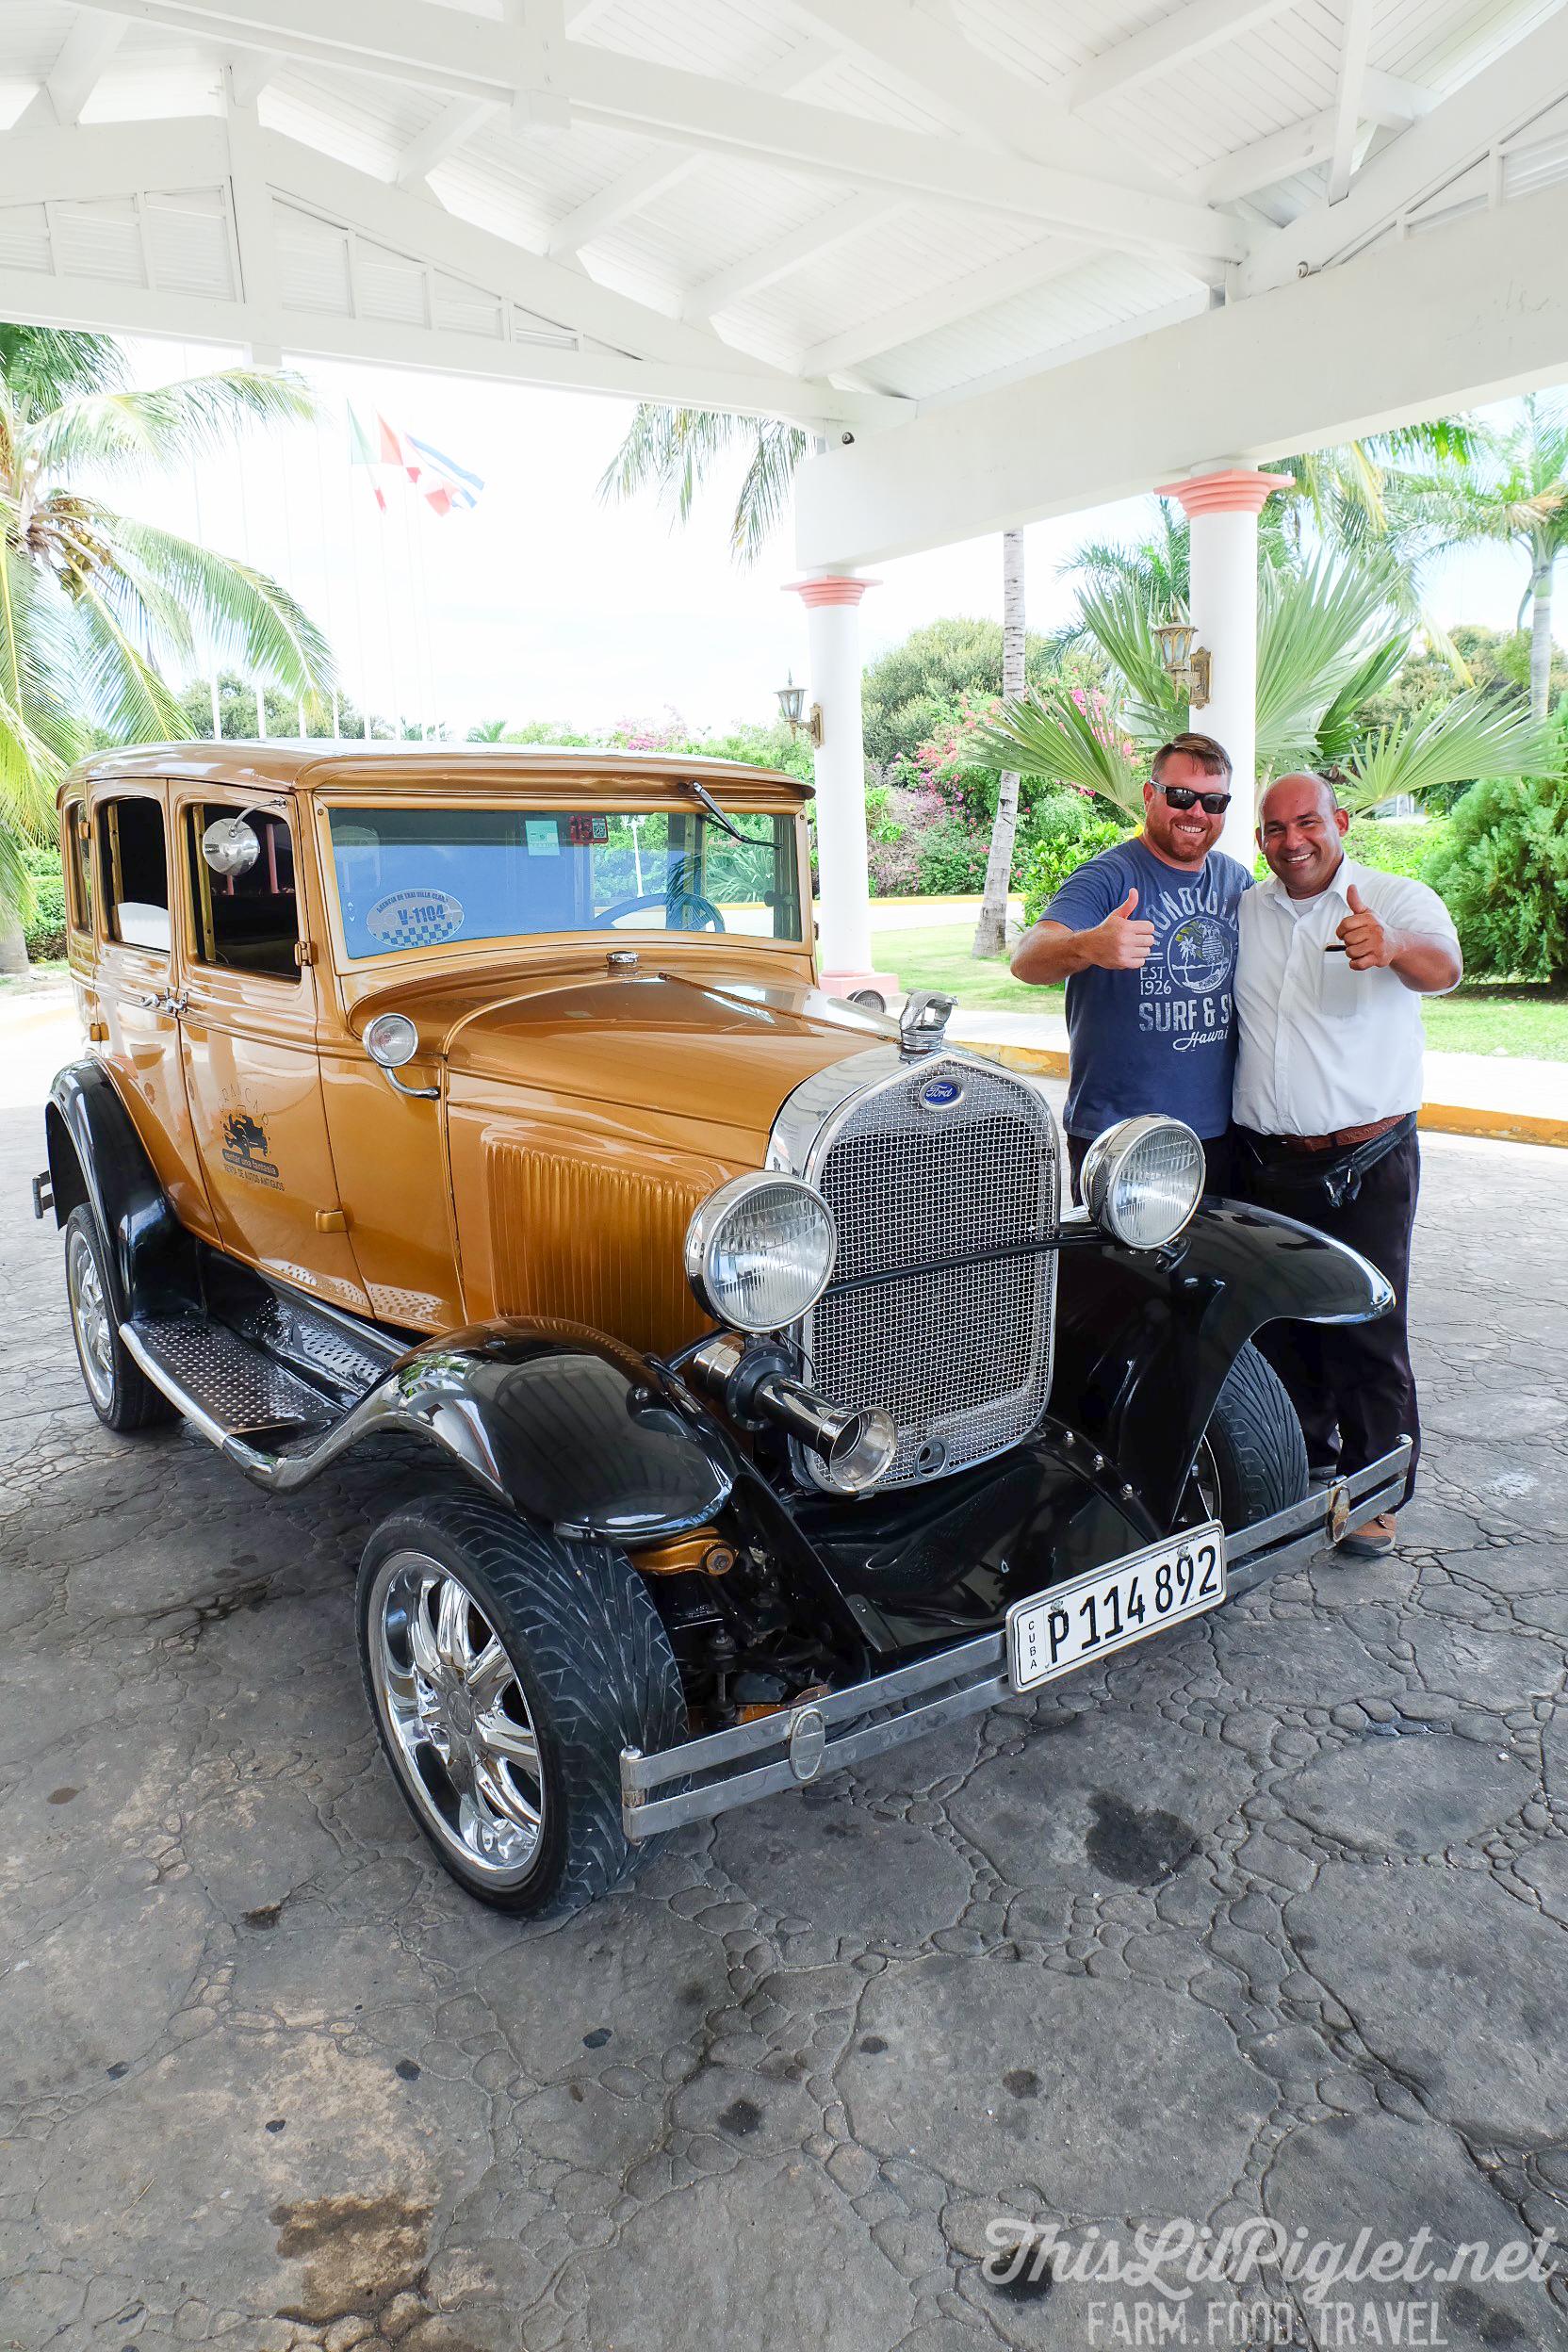 Cuba Couples Travel: Cuba's Old Classic Cars // thislilpiglet.net